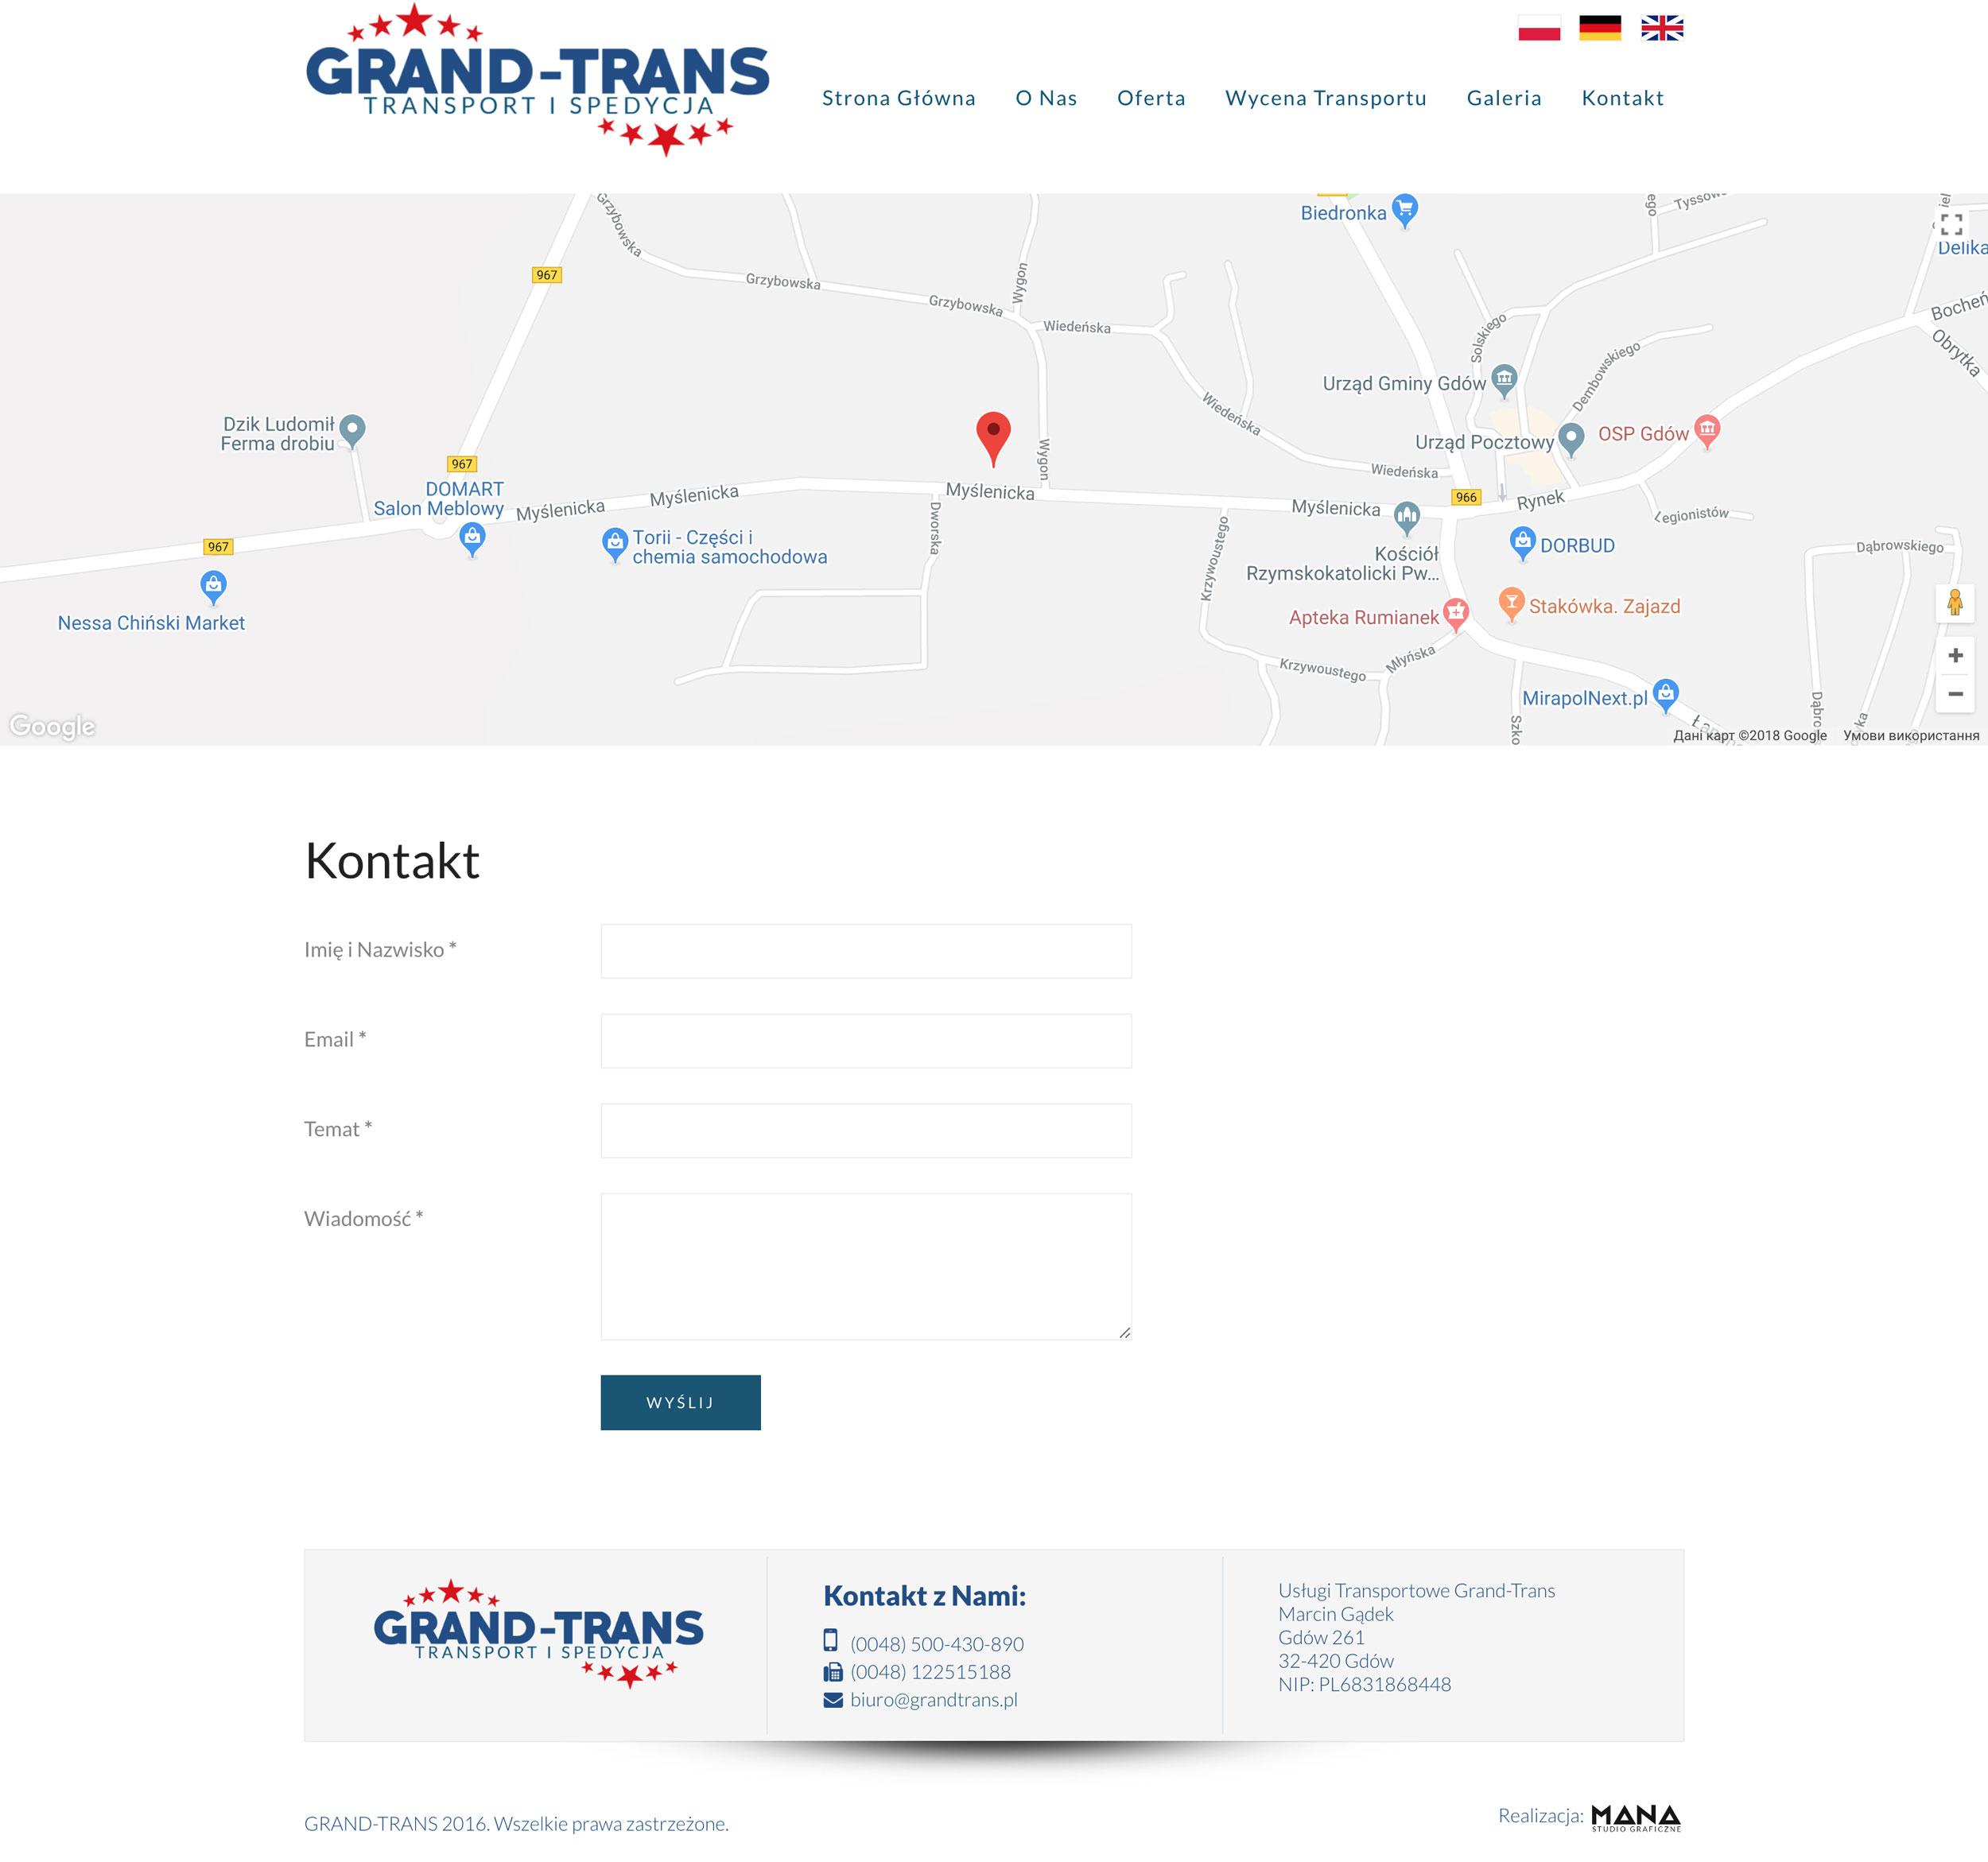 Grand-Trans - Kontakt